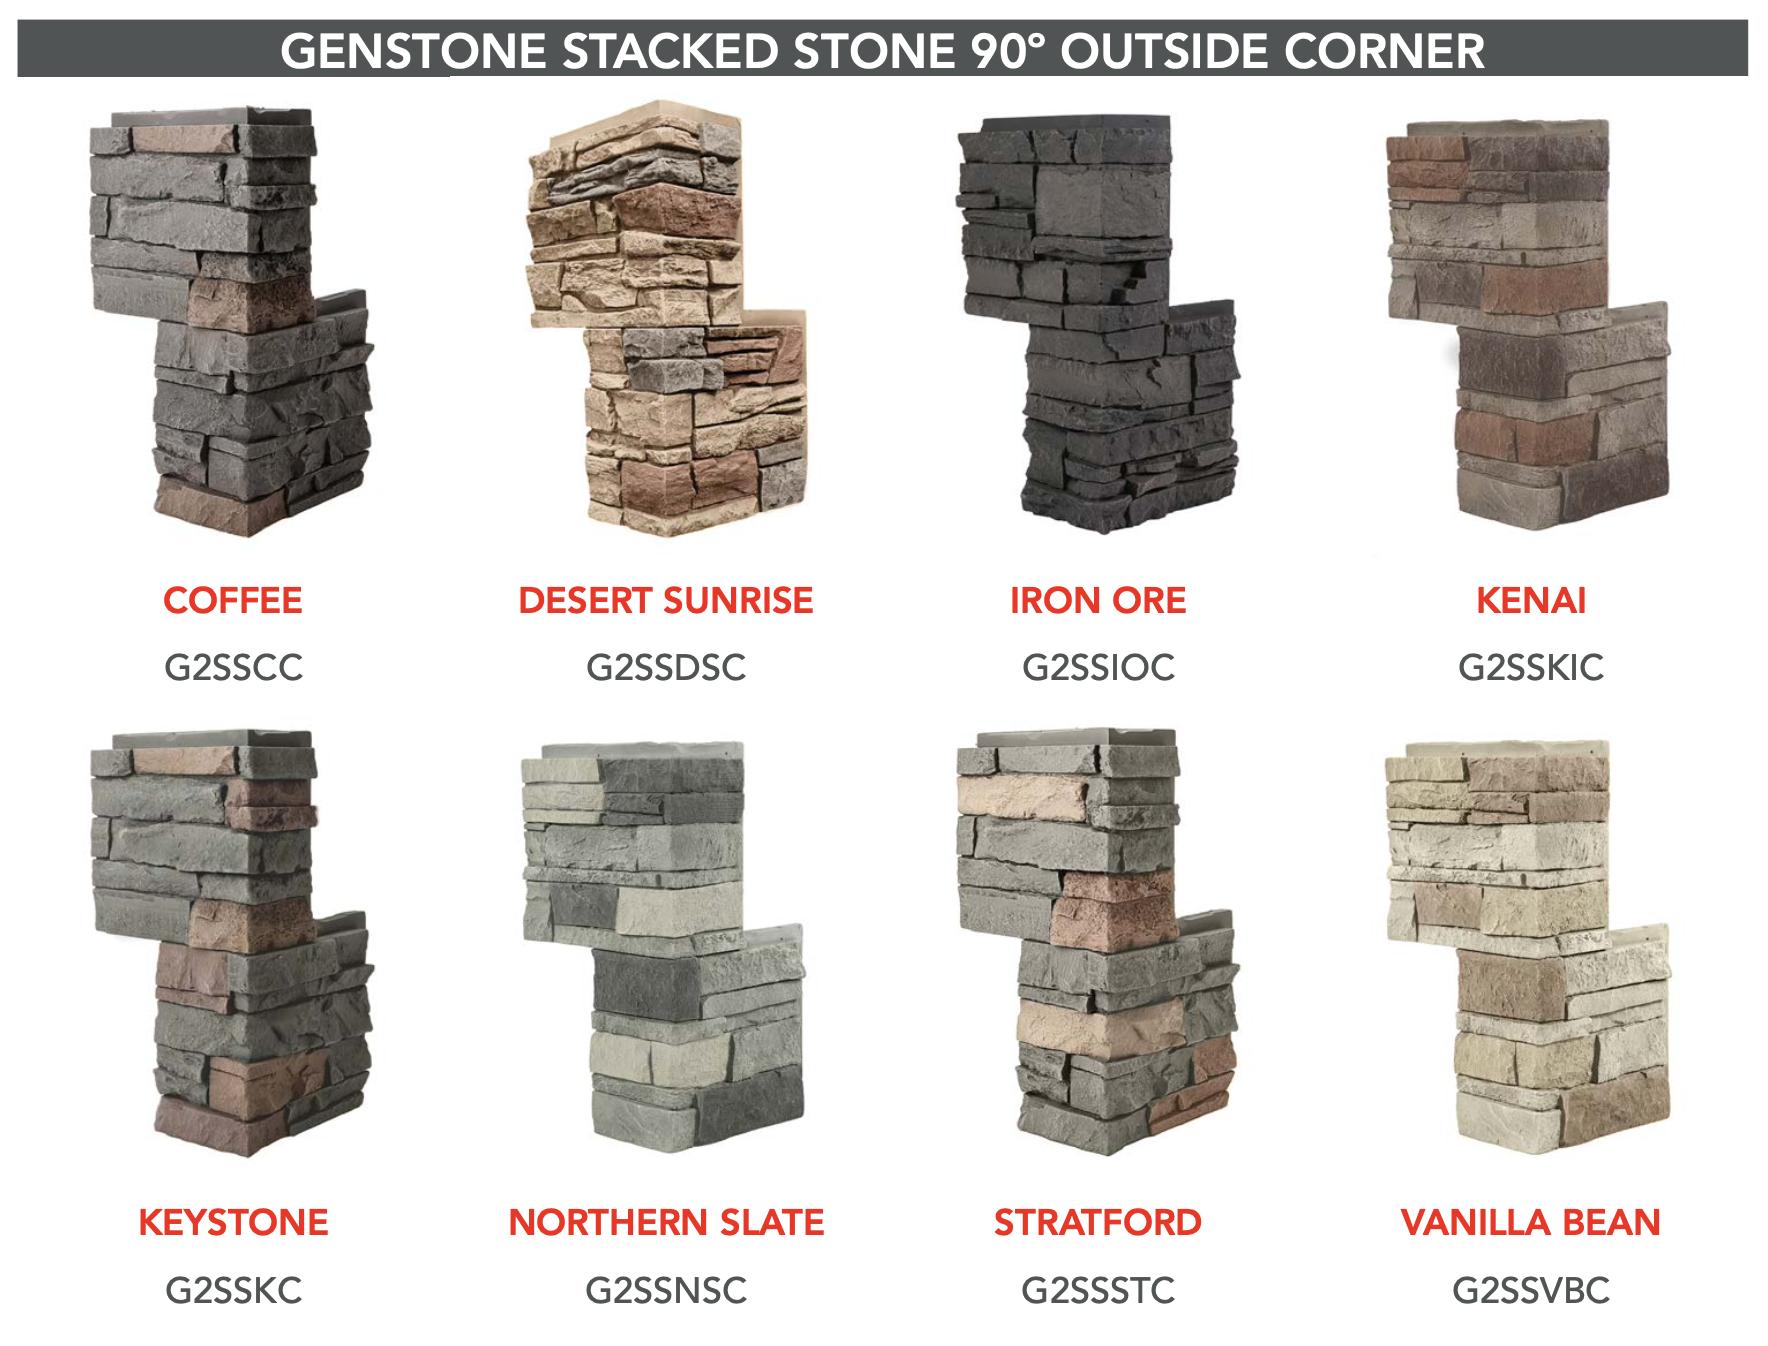 genstone-outside-corner.png